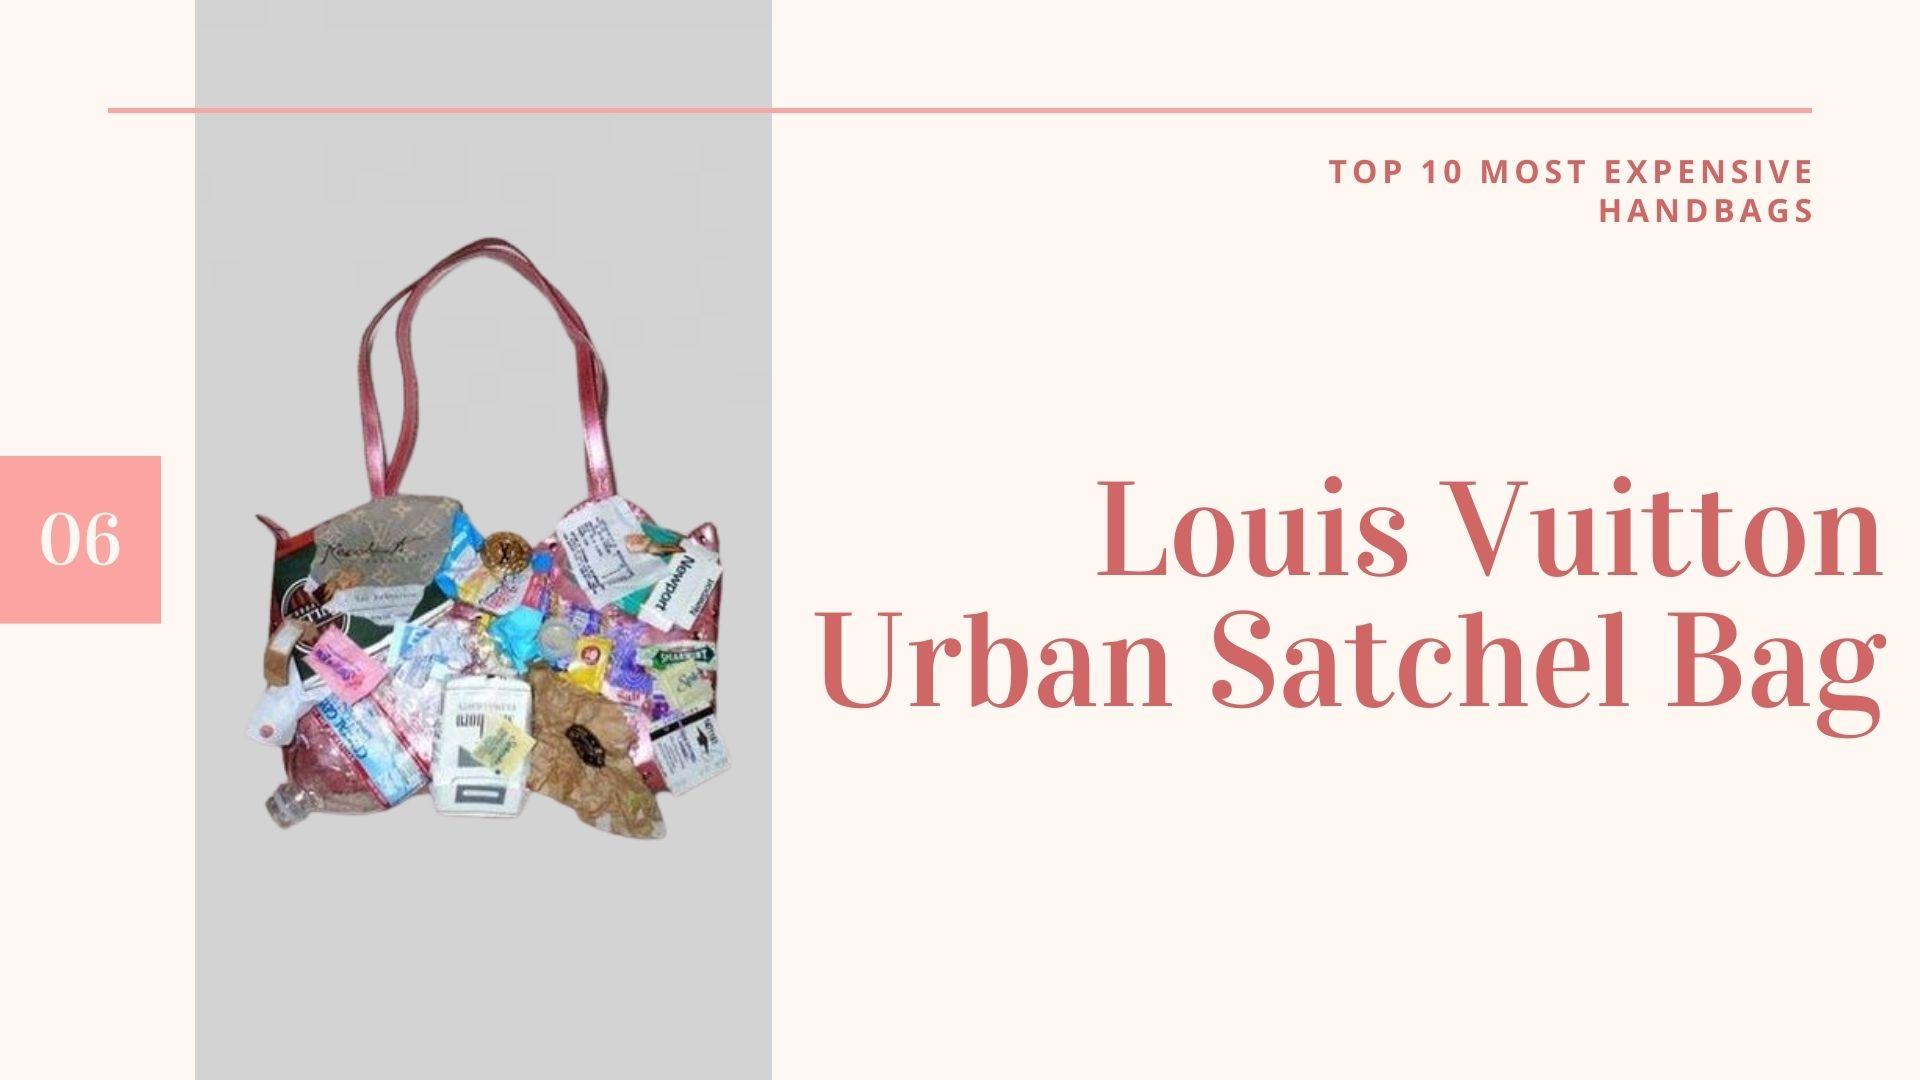 Louis Vuitton Urban Satchel Bag - กระเป๋าที่แพงที่สุดในโลก